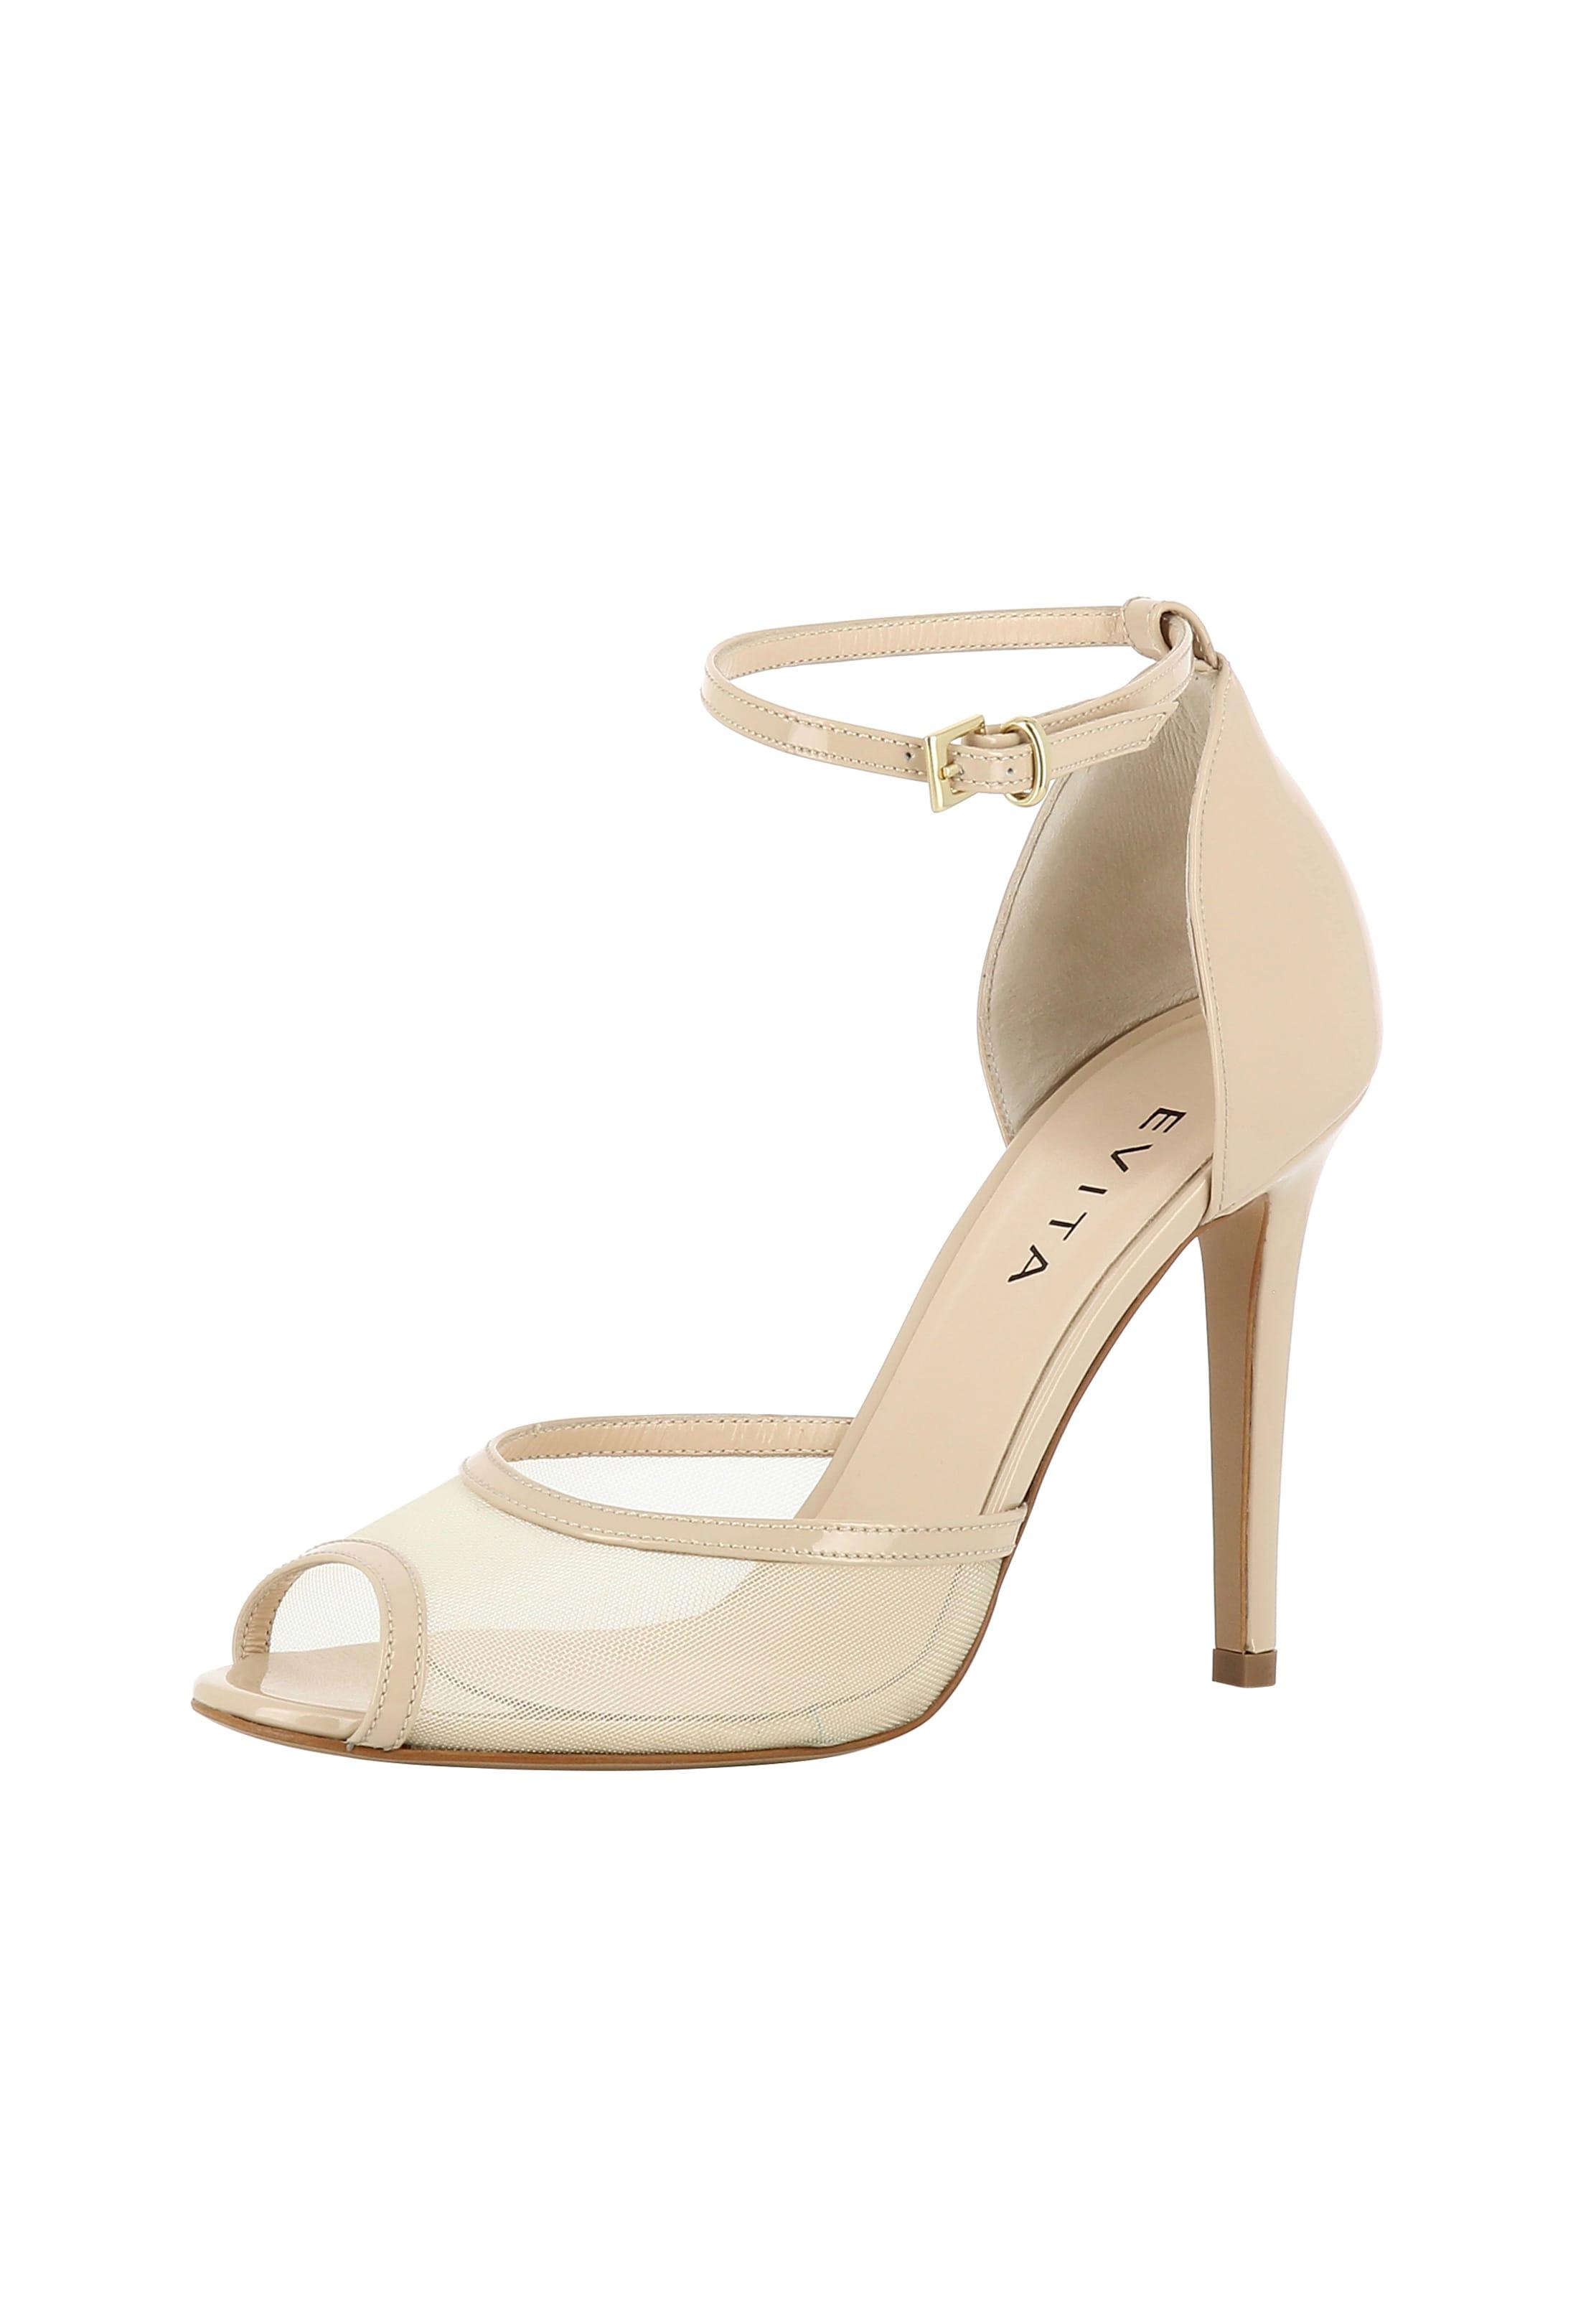 EVITA Peeptoe ALESSANDRA Verschleißfeste billige Schuhe